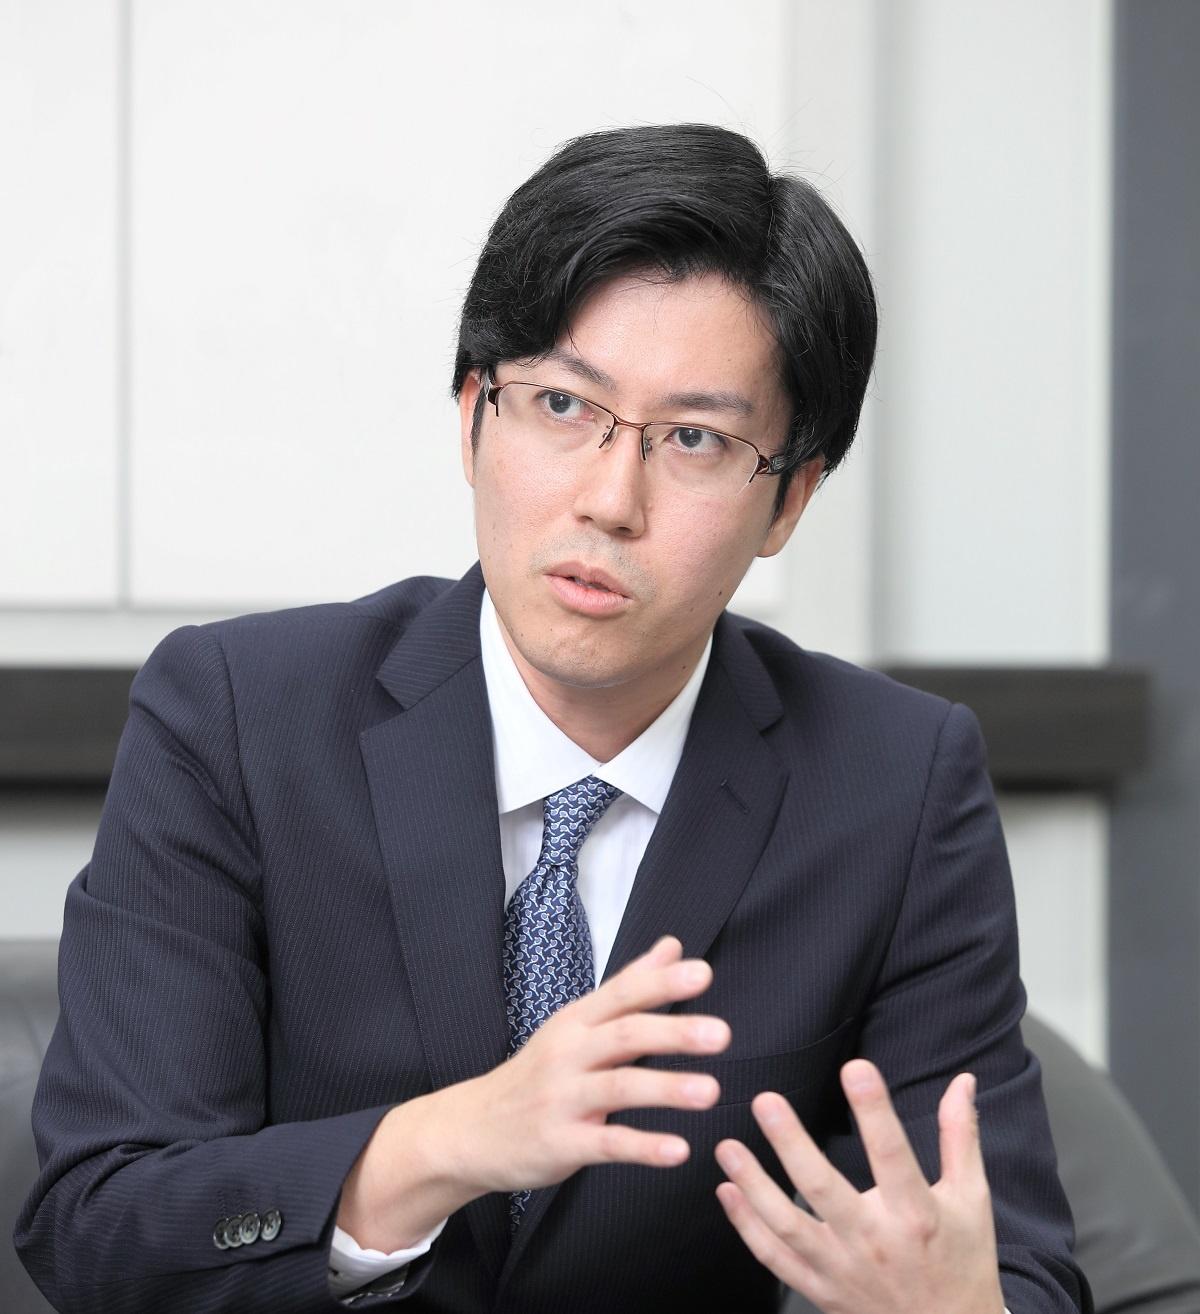 AMI代表取締役CEOの小川晋平氏。熊本大学医学部を卒業した現役医師で、今も循環器内科医として定期的に臨床現場に立っている(出所:AMI、以下同)